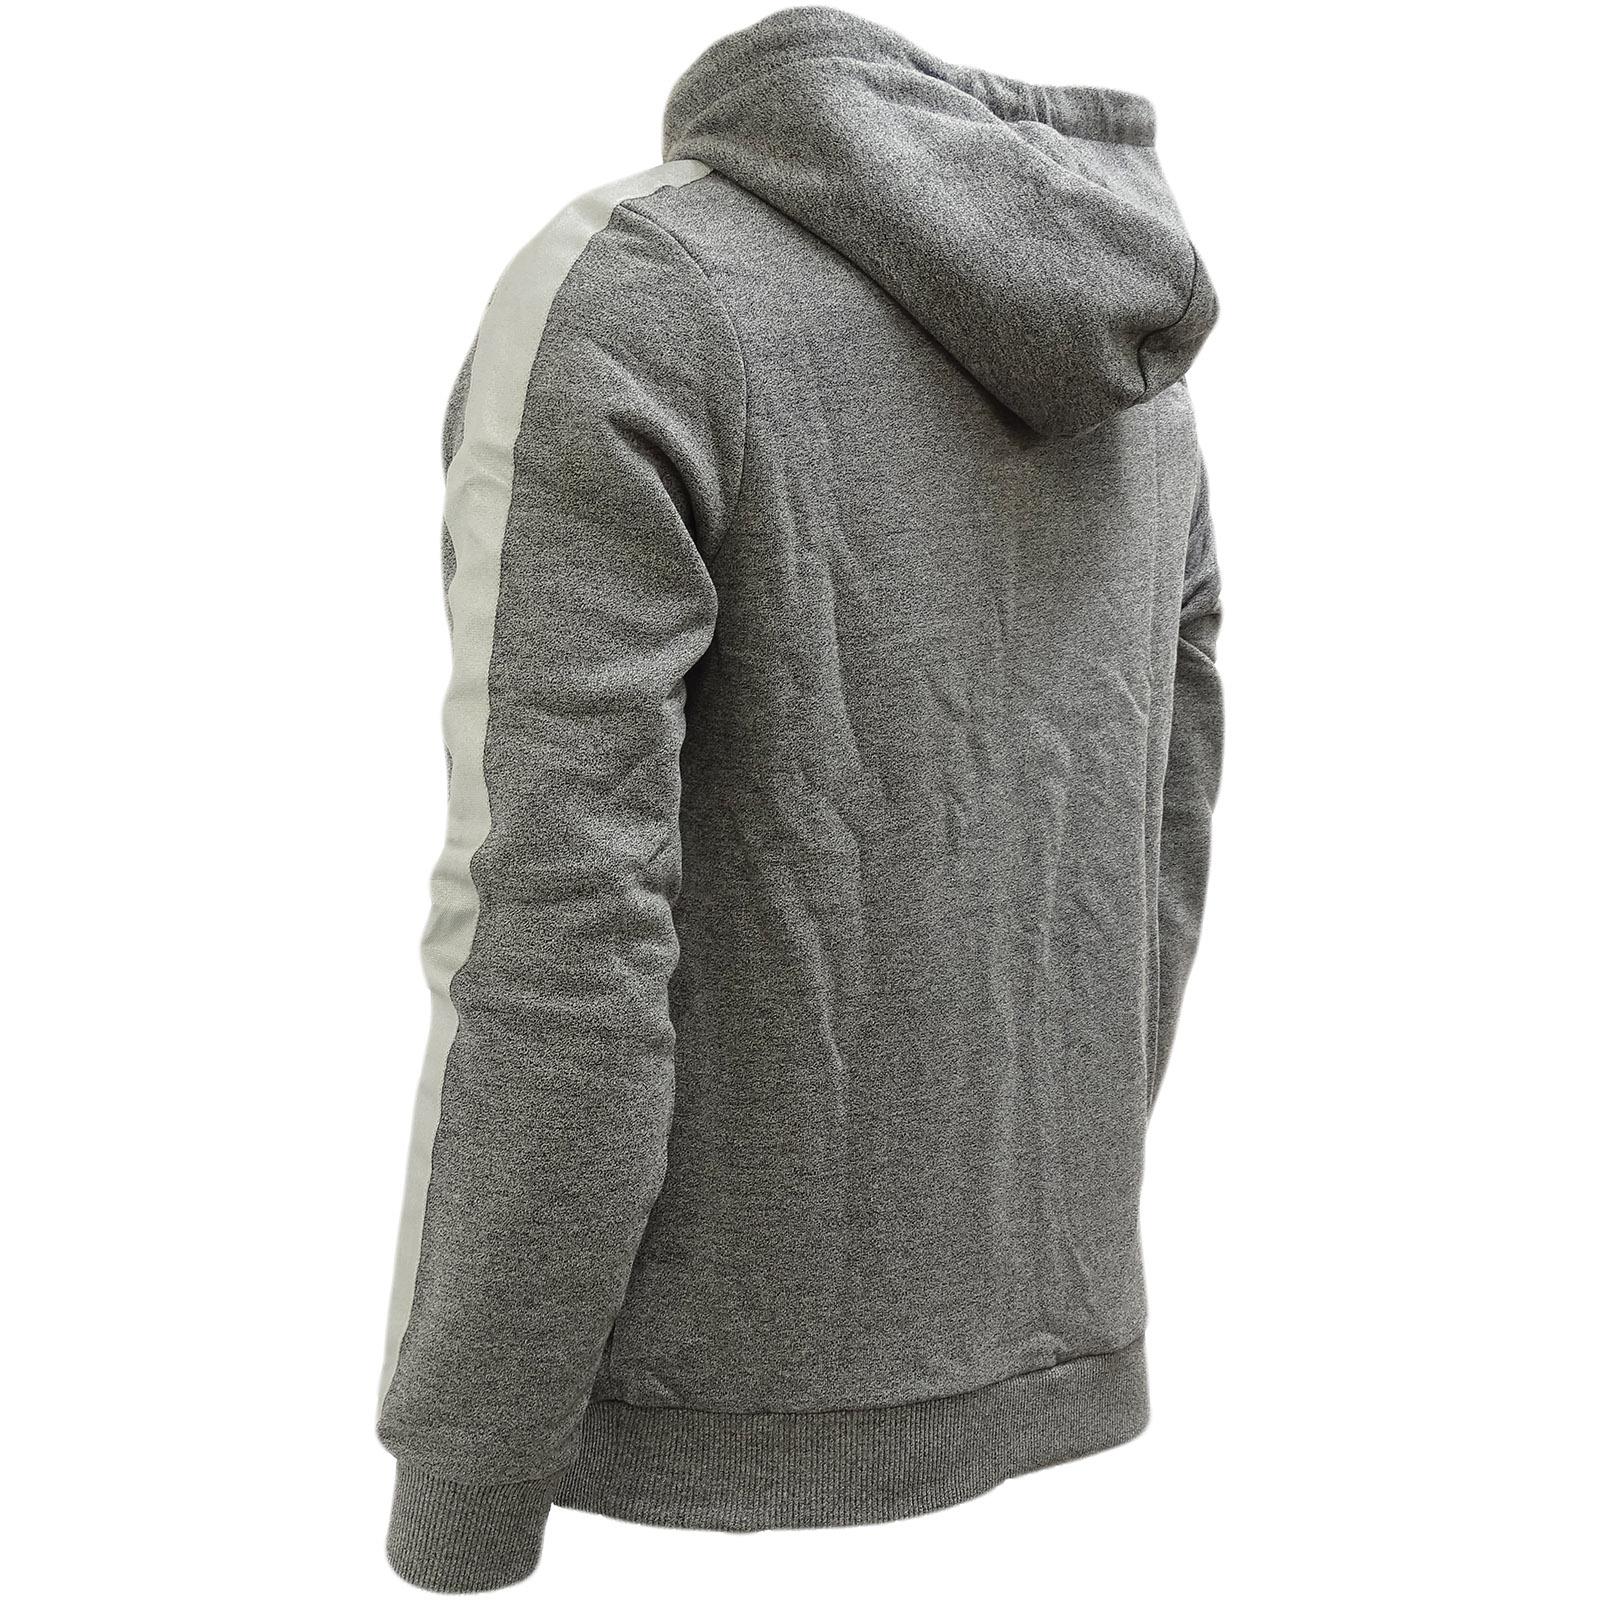 Sweatshirt G Hype Sweatshirt G Hype Hype Sweatshirt 4qOPpwS